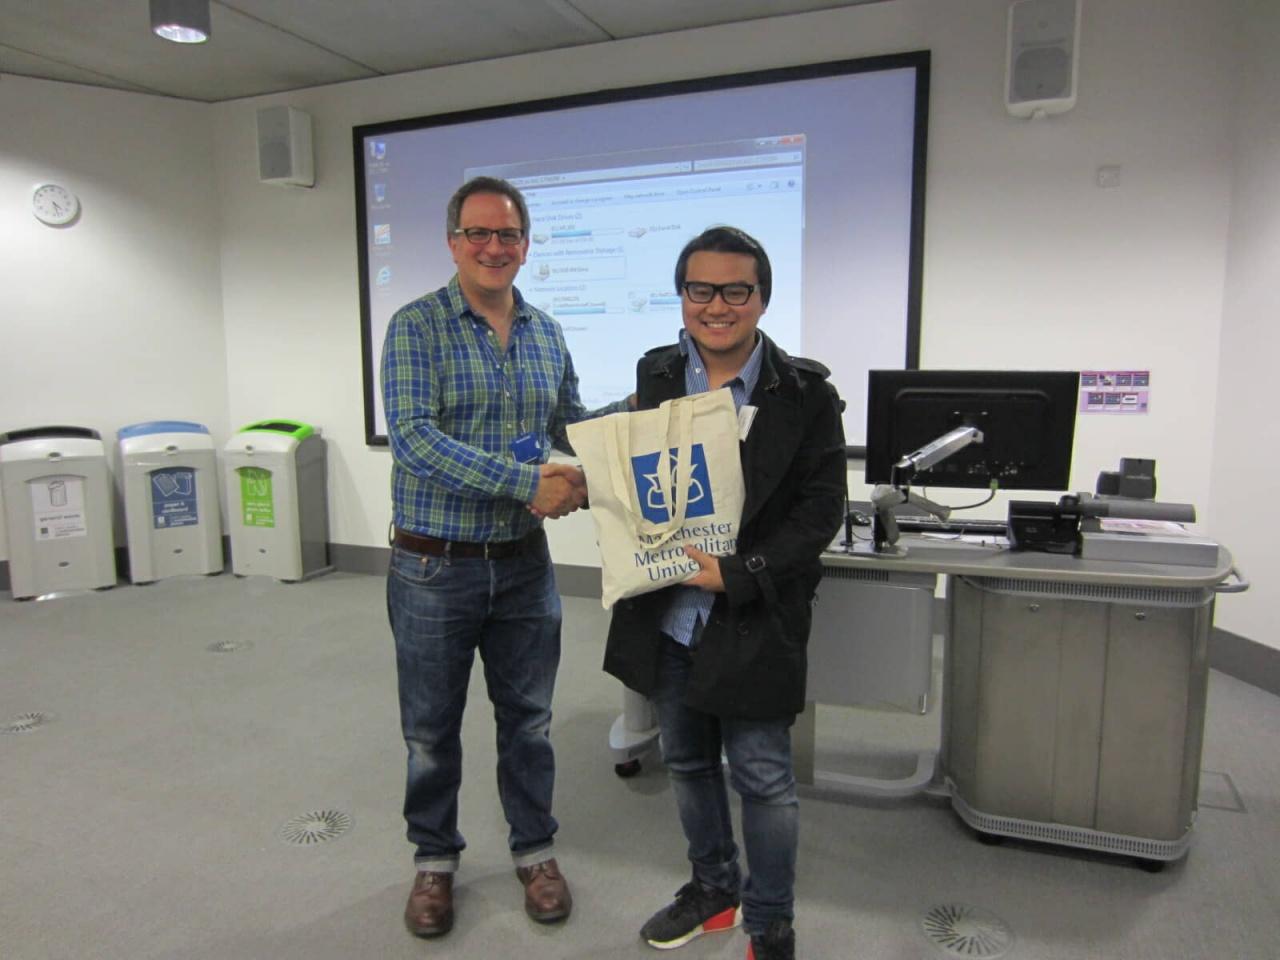 Dr Stephen Buzdugan and student